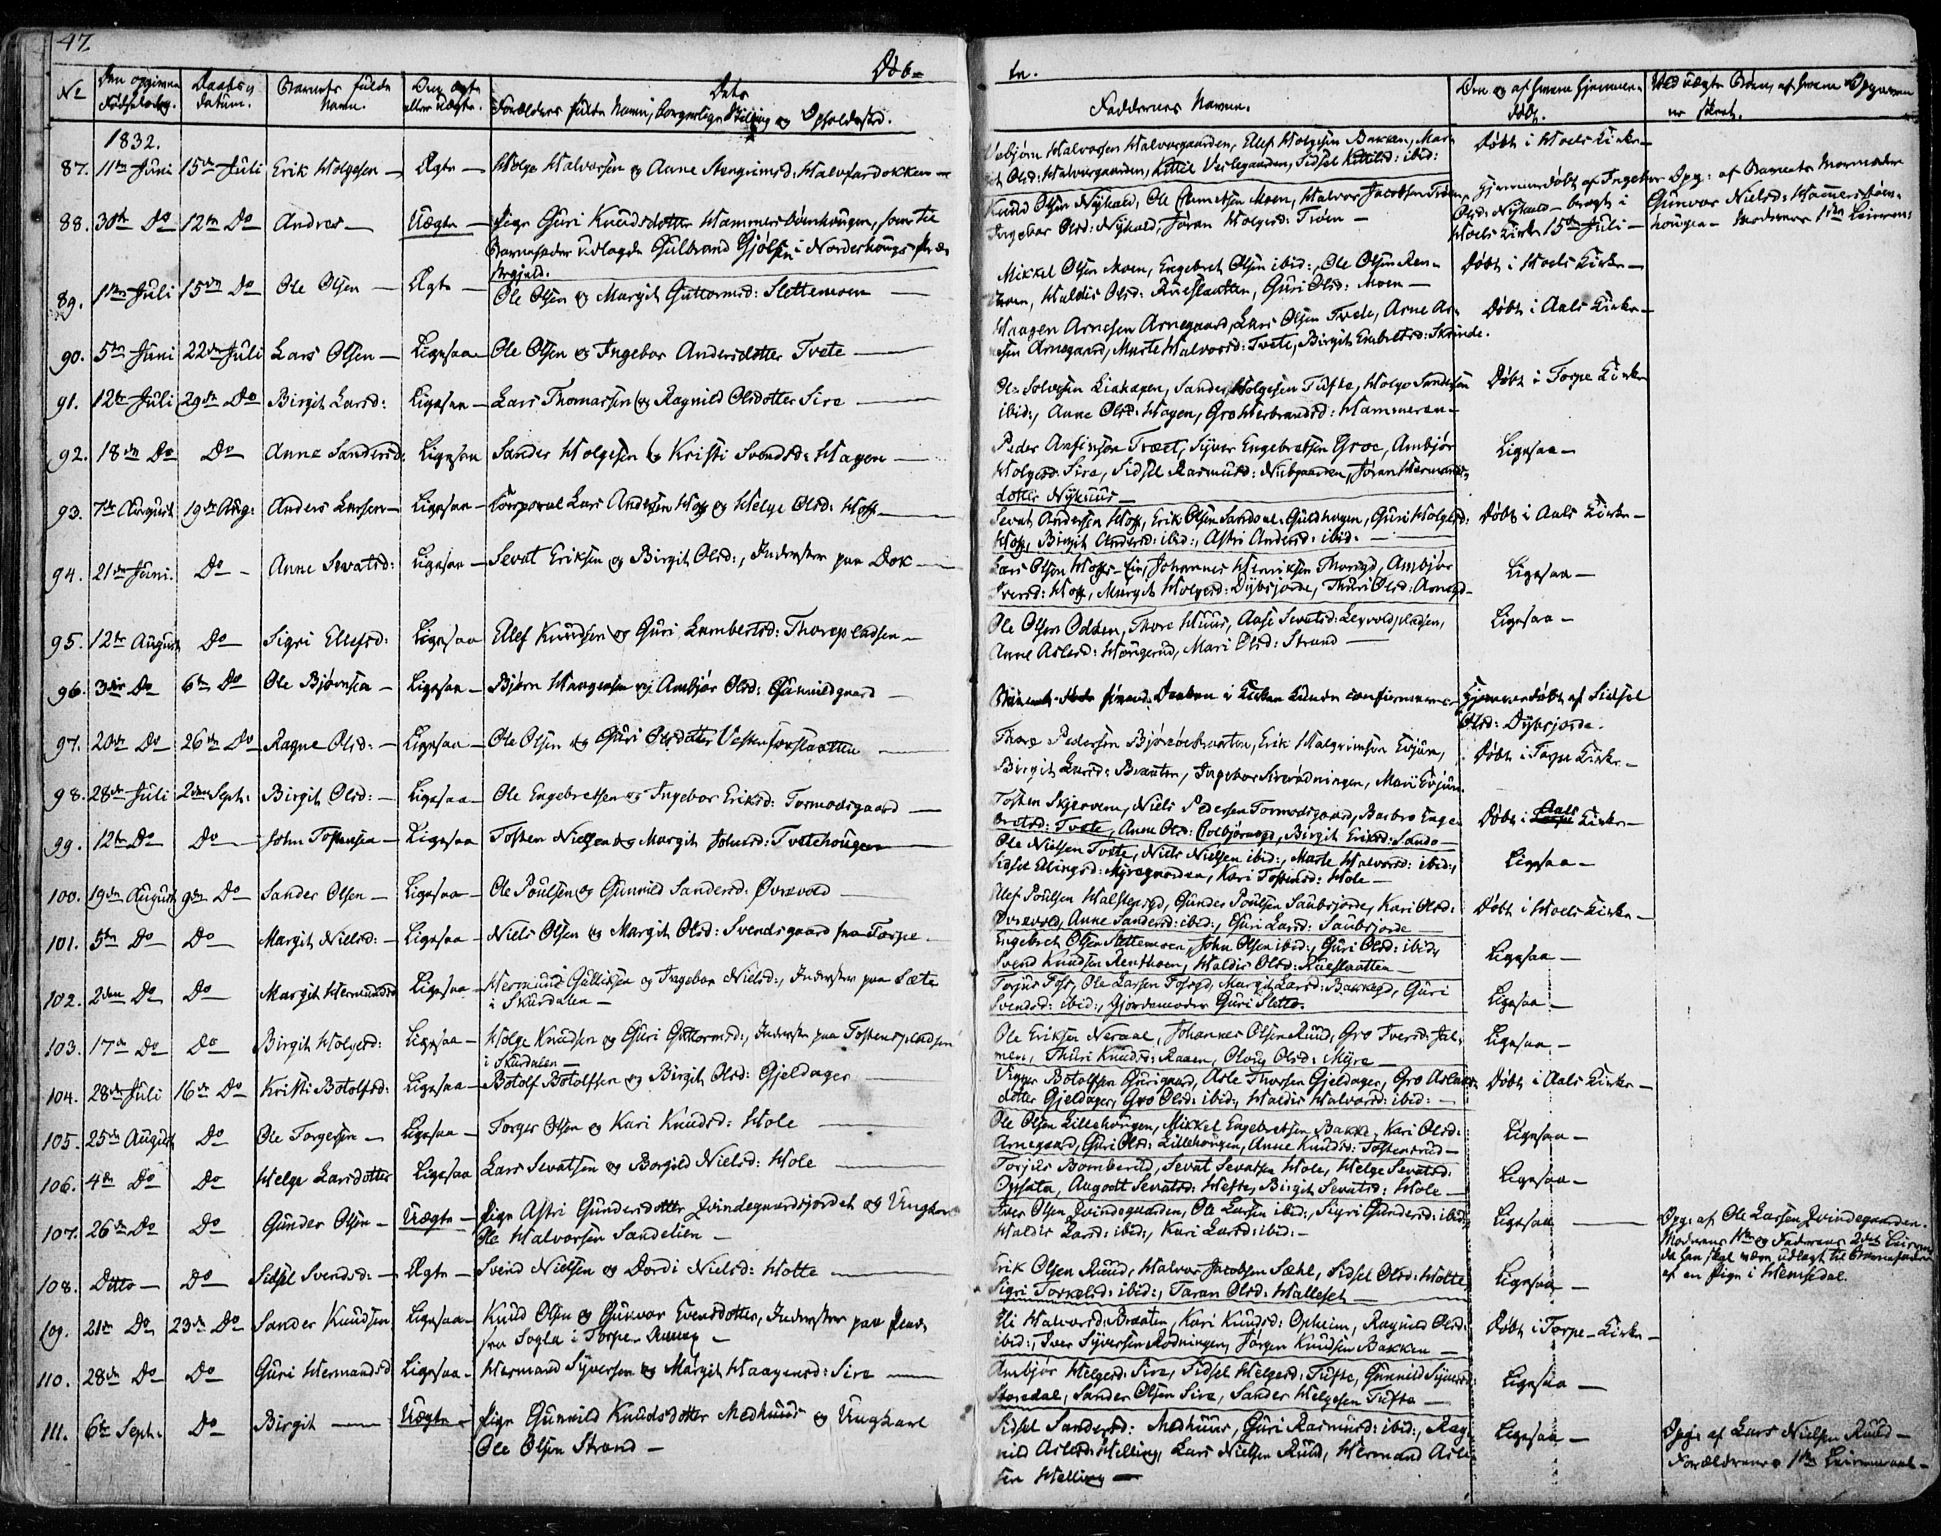 SAKO, Ål kirkebøker, F/Fa/L0005: Ministerialbok nr. I 5, 1825-1848, s. 47